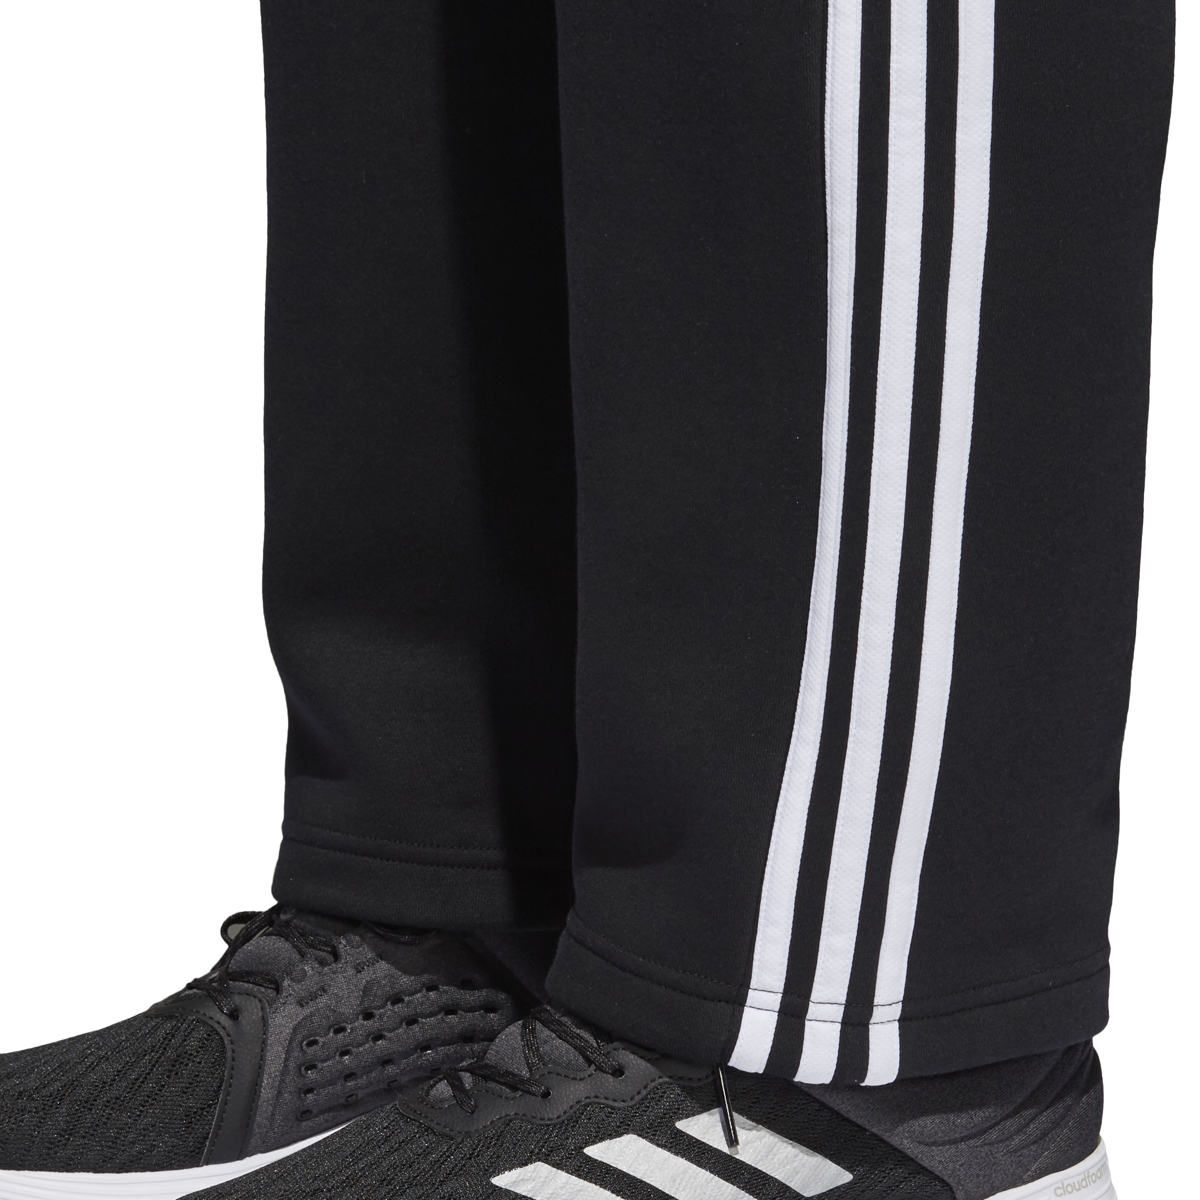 BK7427} Adidas Men's Essentials 3 Stripe Regular Fit Fleece